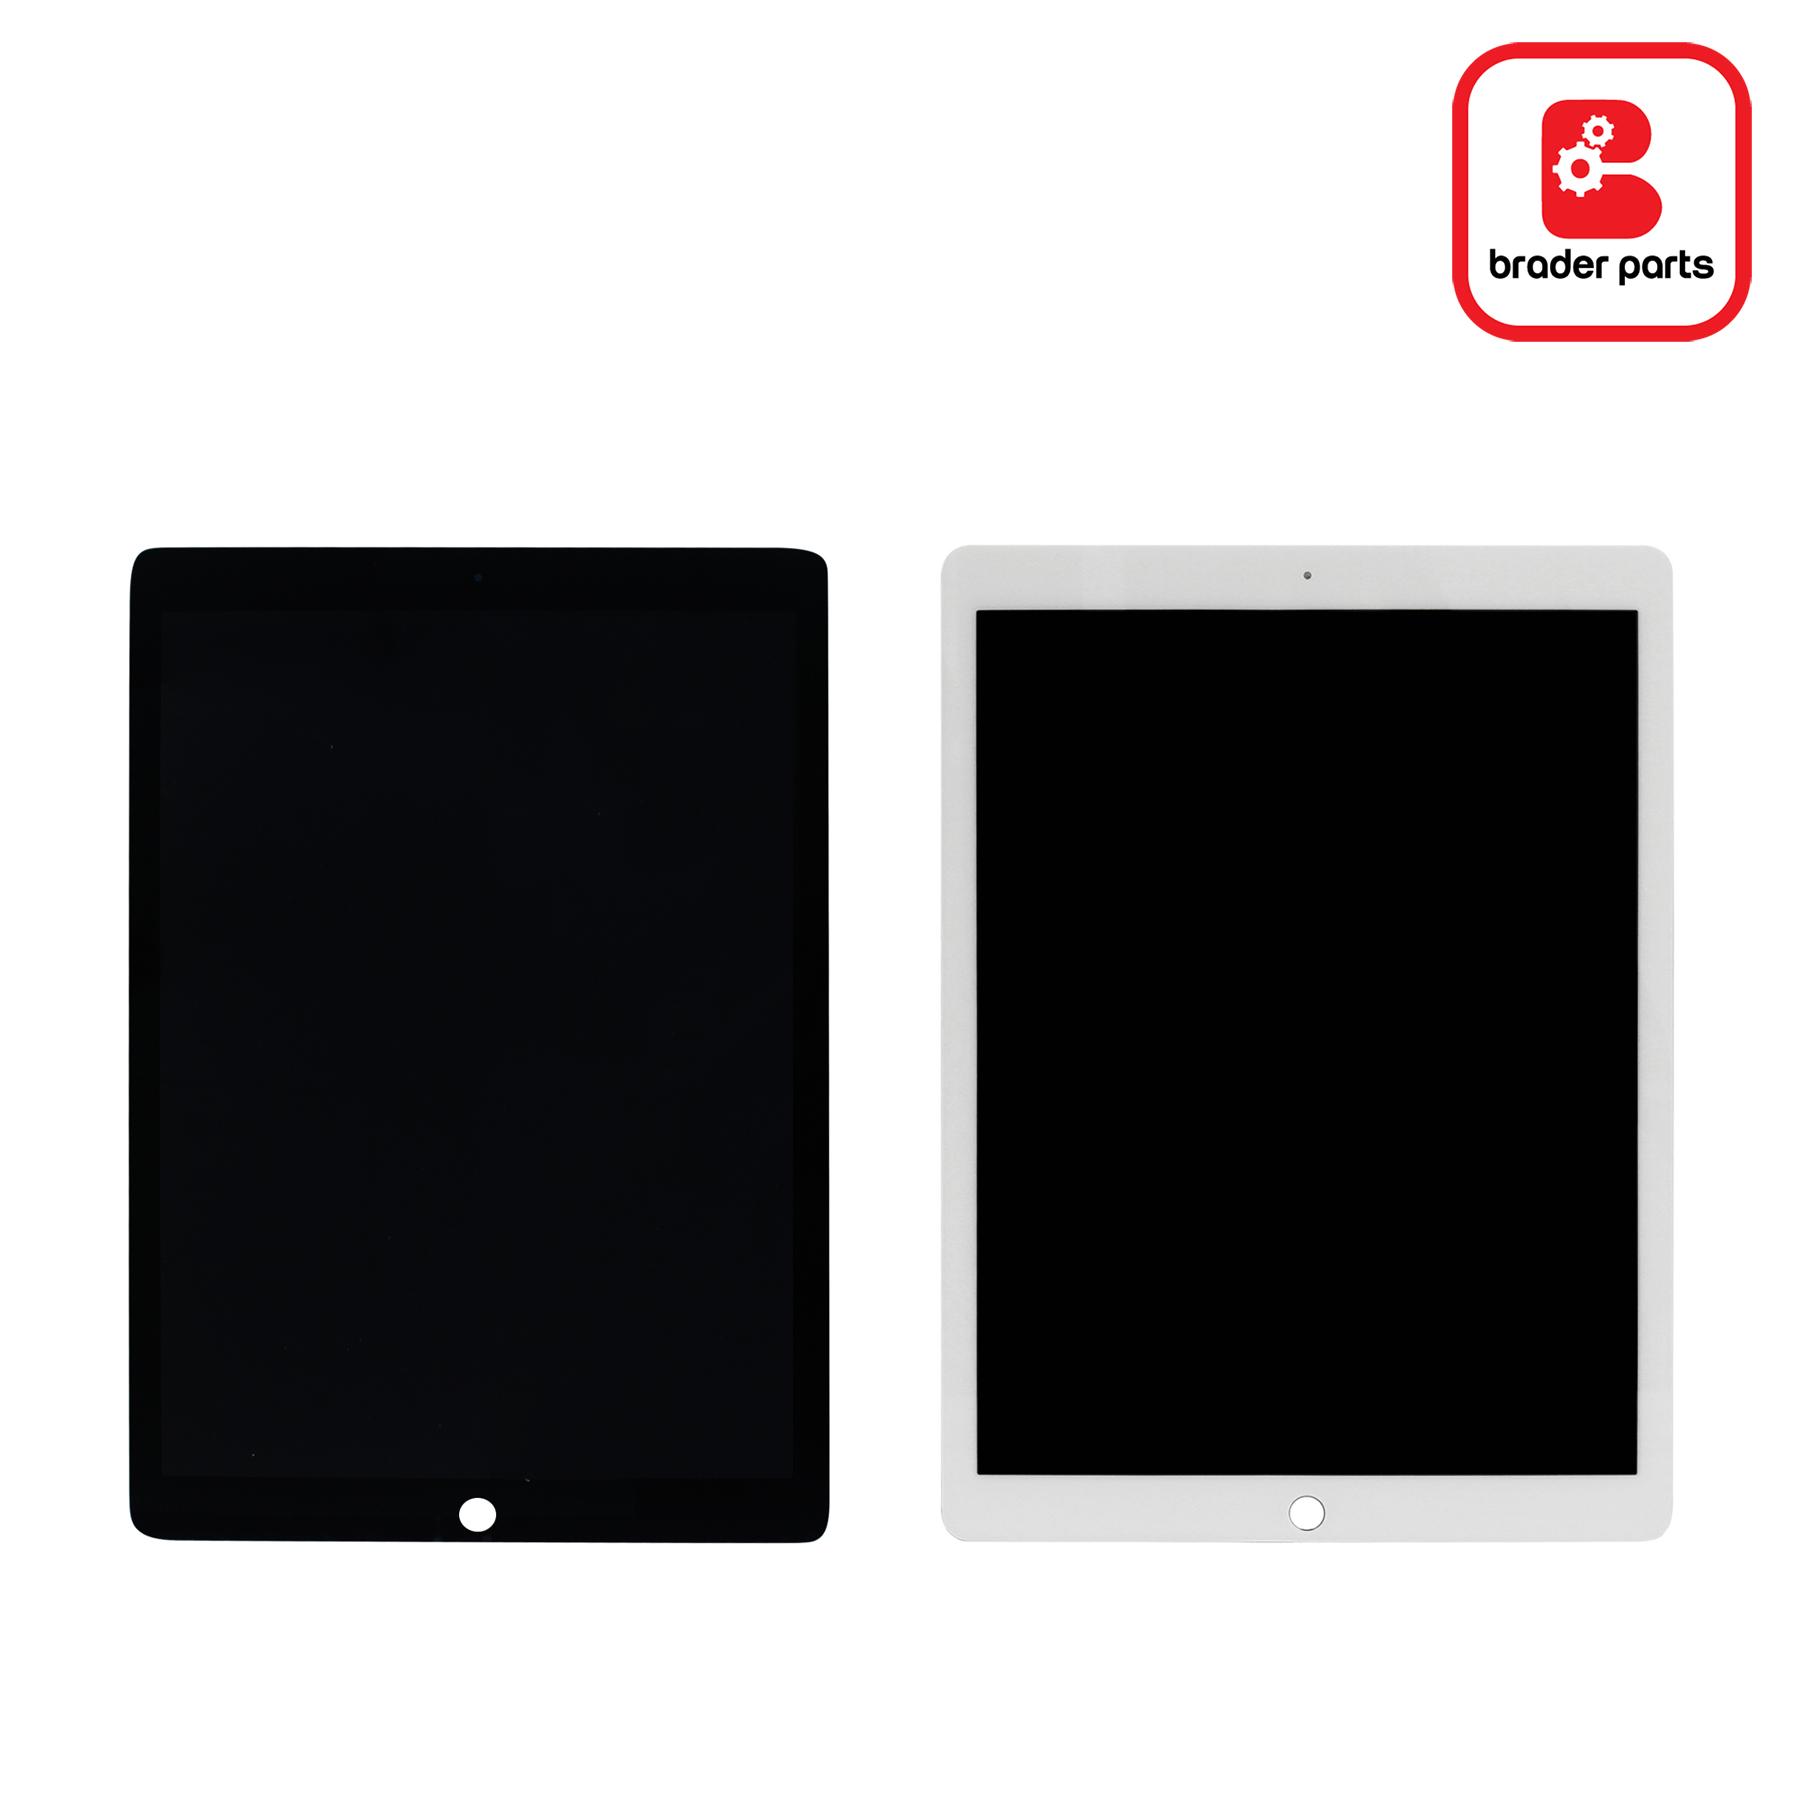 "Lcd Touchscreen iPad Pro 12.9"" Gen 1"